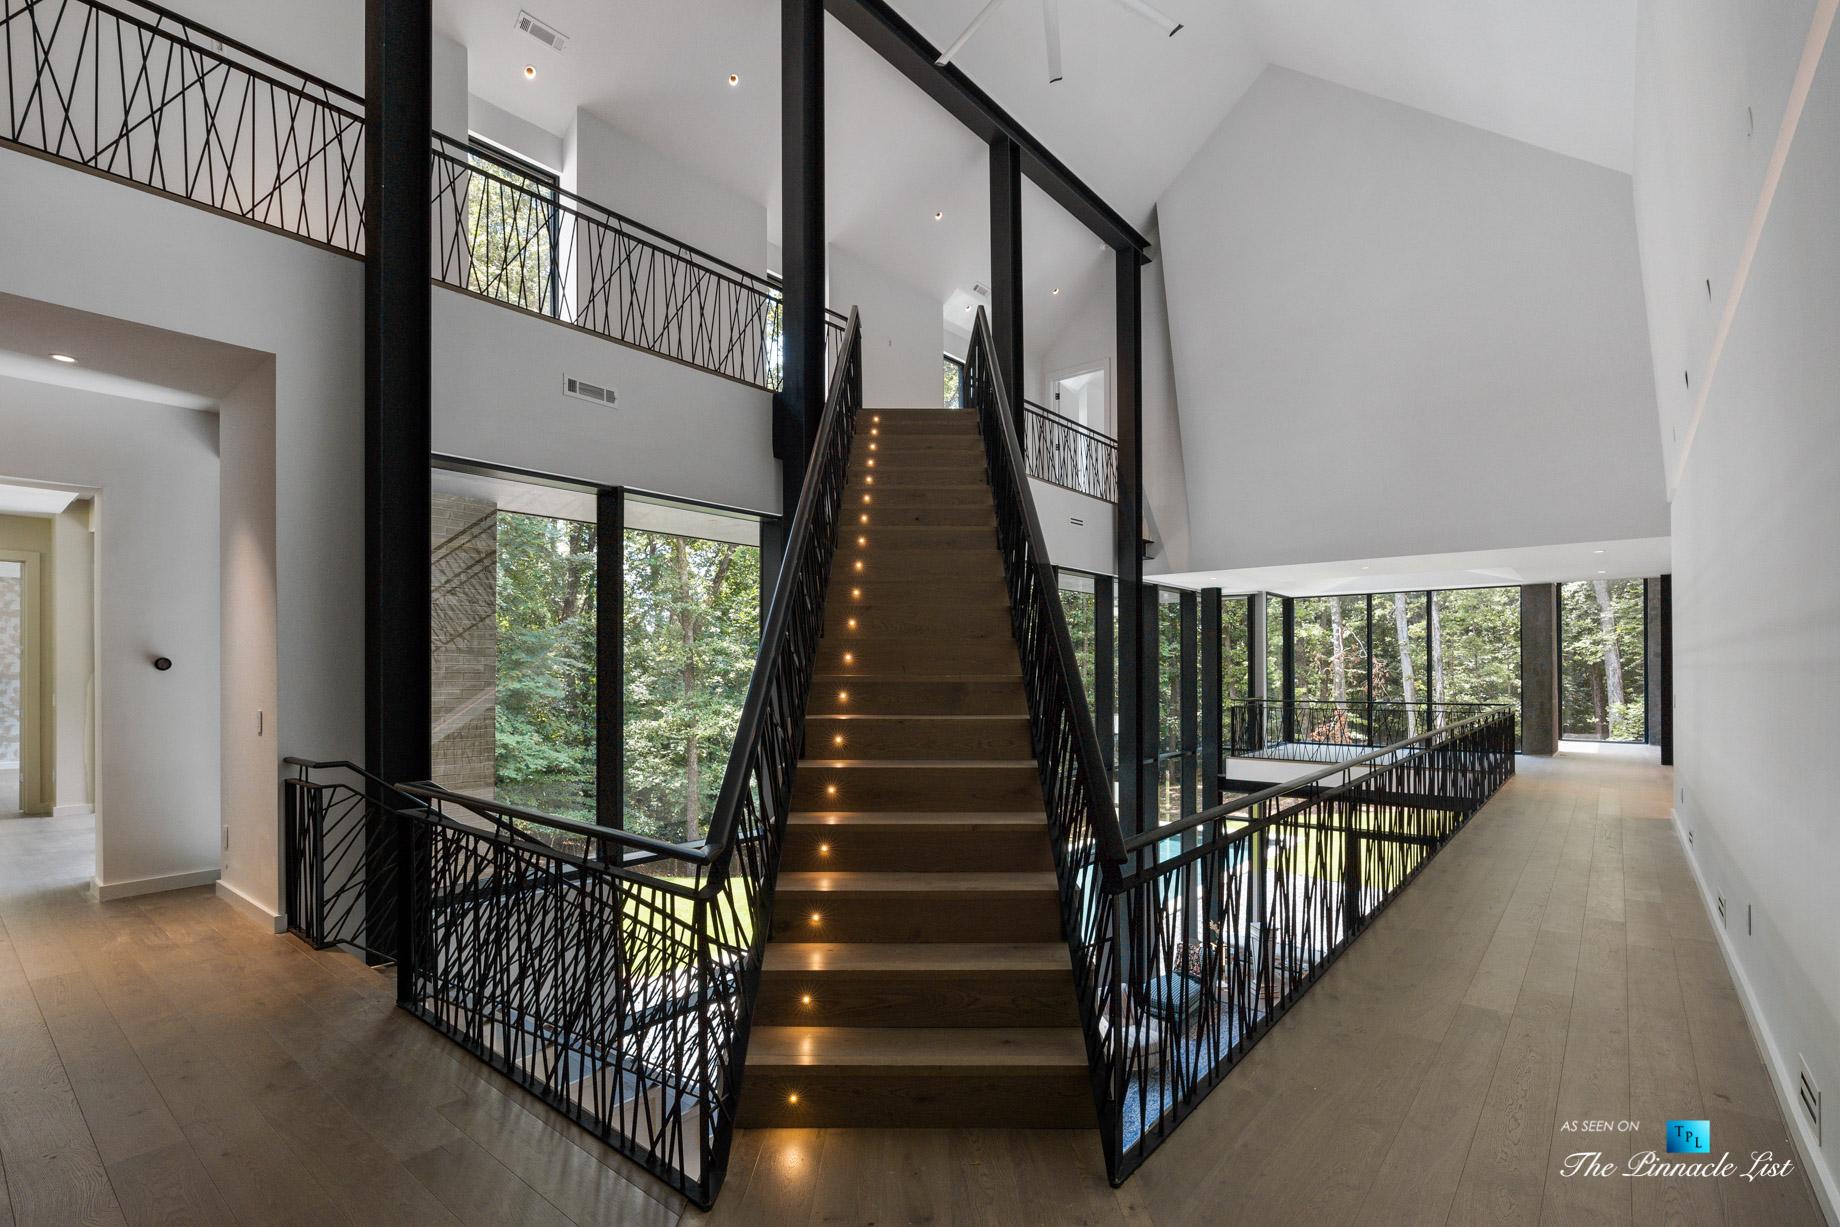 2716 Ridgewood Rd NW, Atlanta, GA, USA – Main Stairs – Luxury Real Estate – Modern Contemporary Buckhead Home